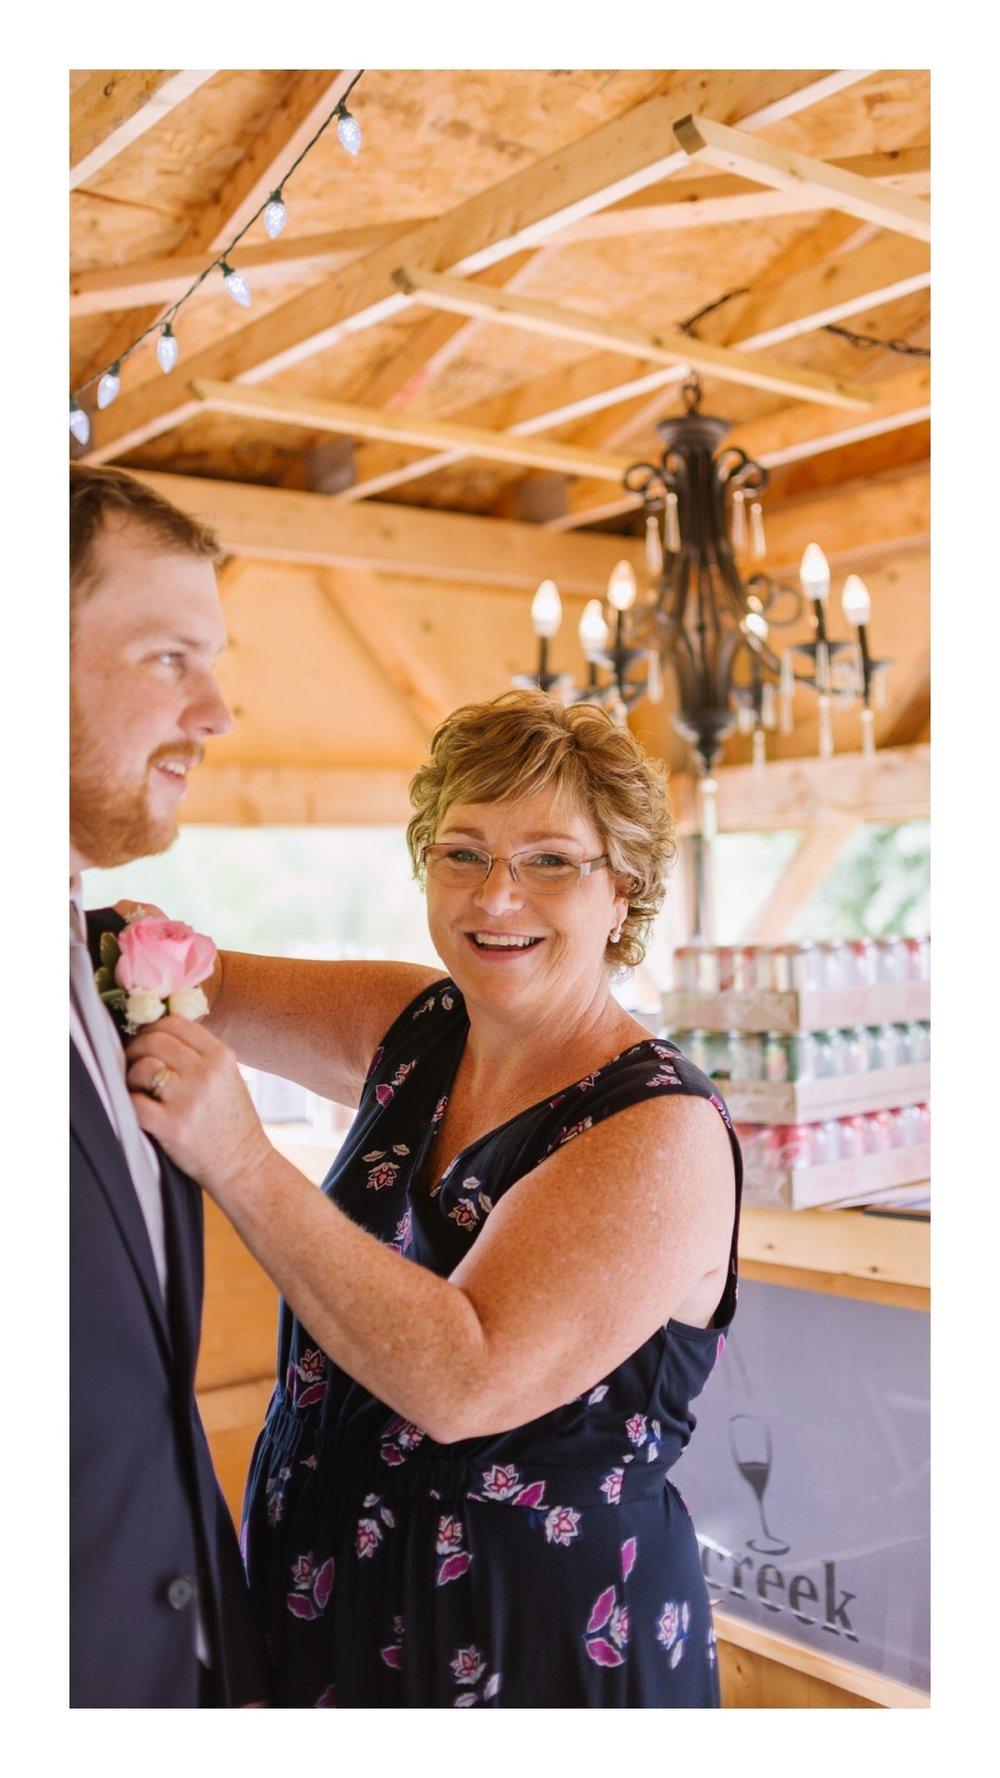 Kristy & Ryan's Rustic Winery Wedding   Halifax Wedding Photographer